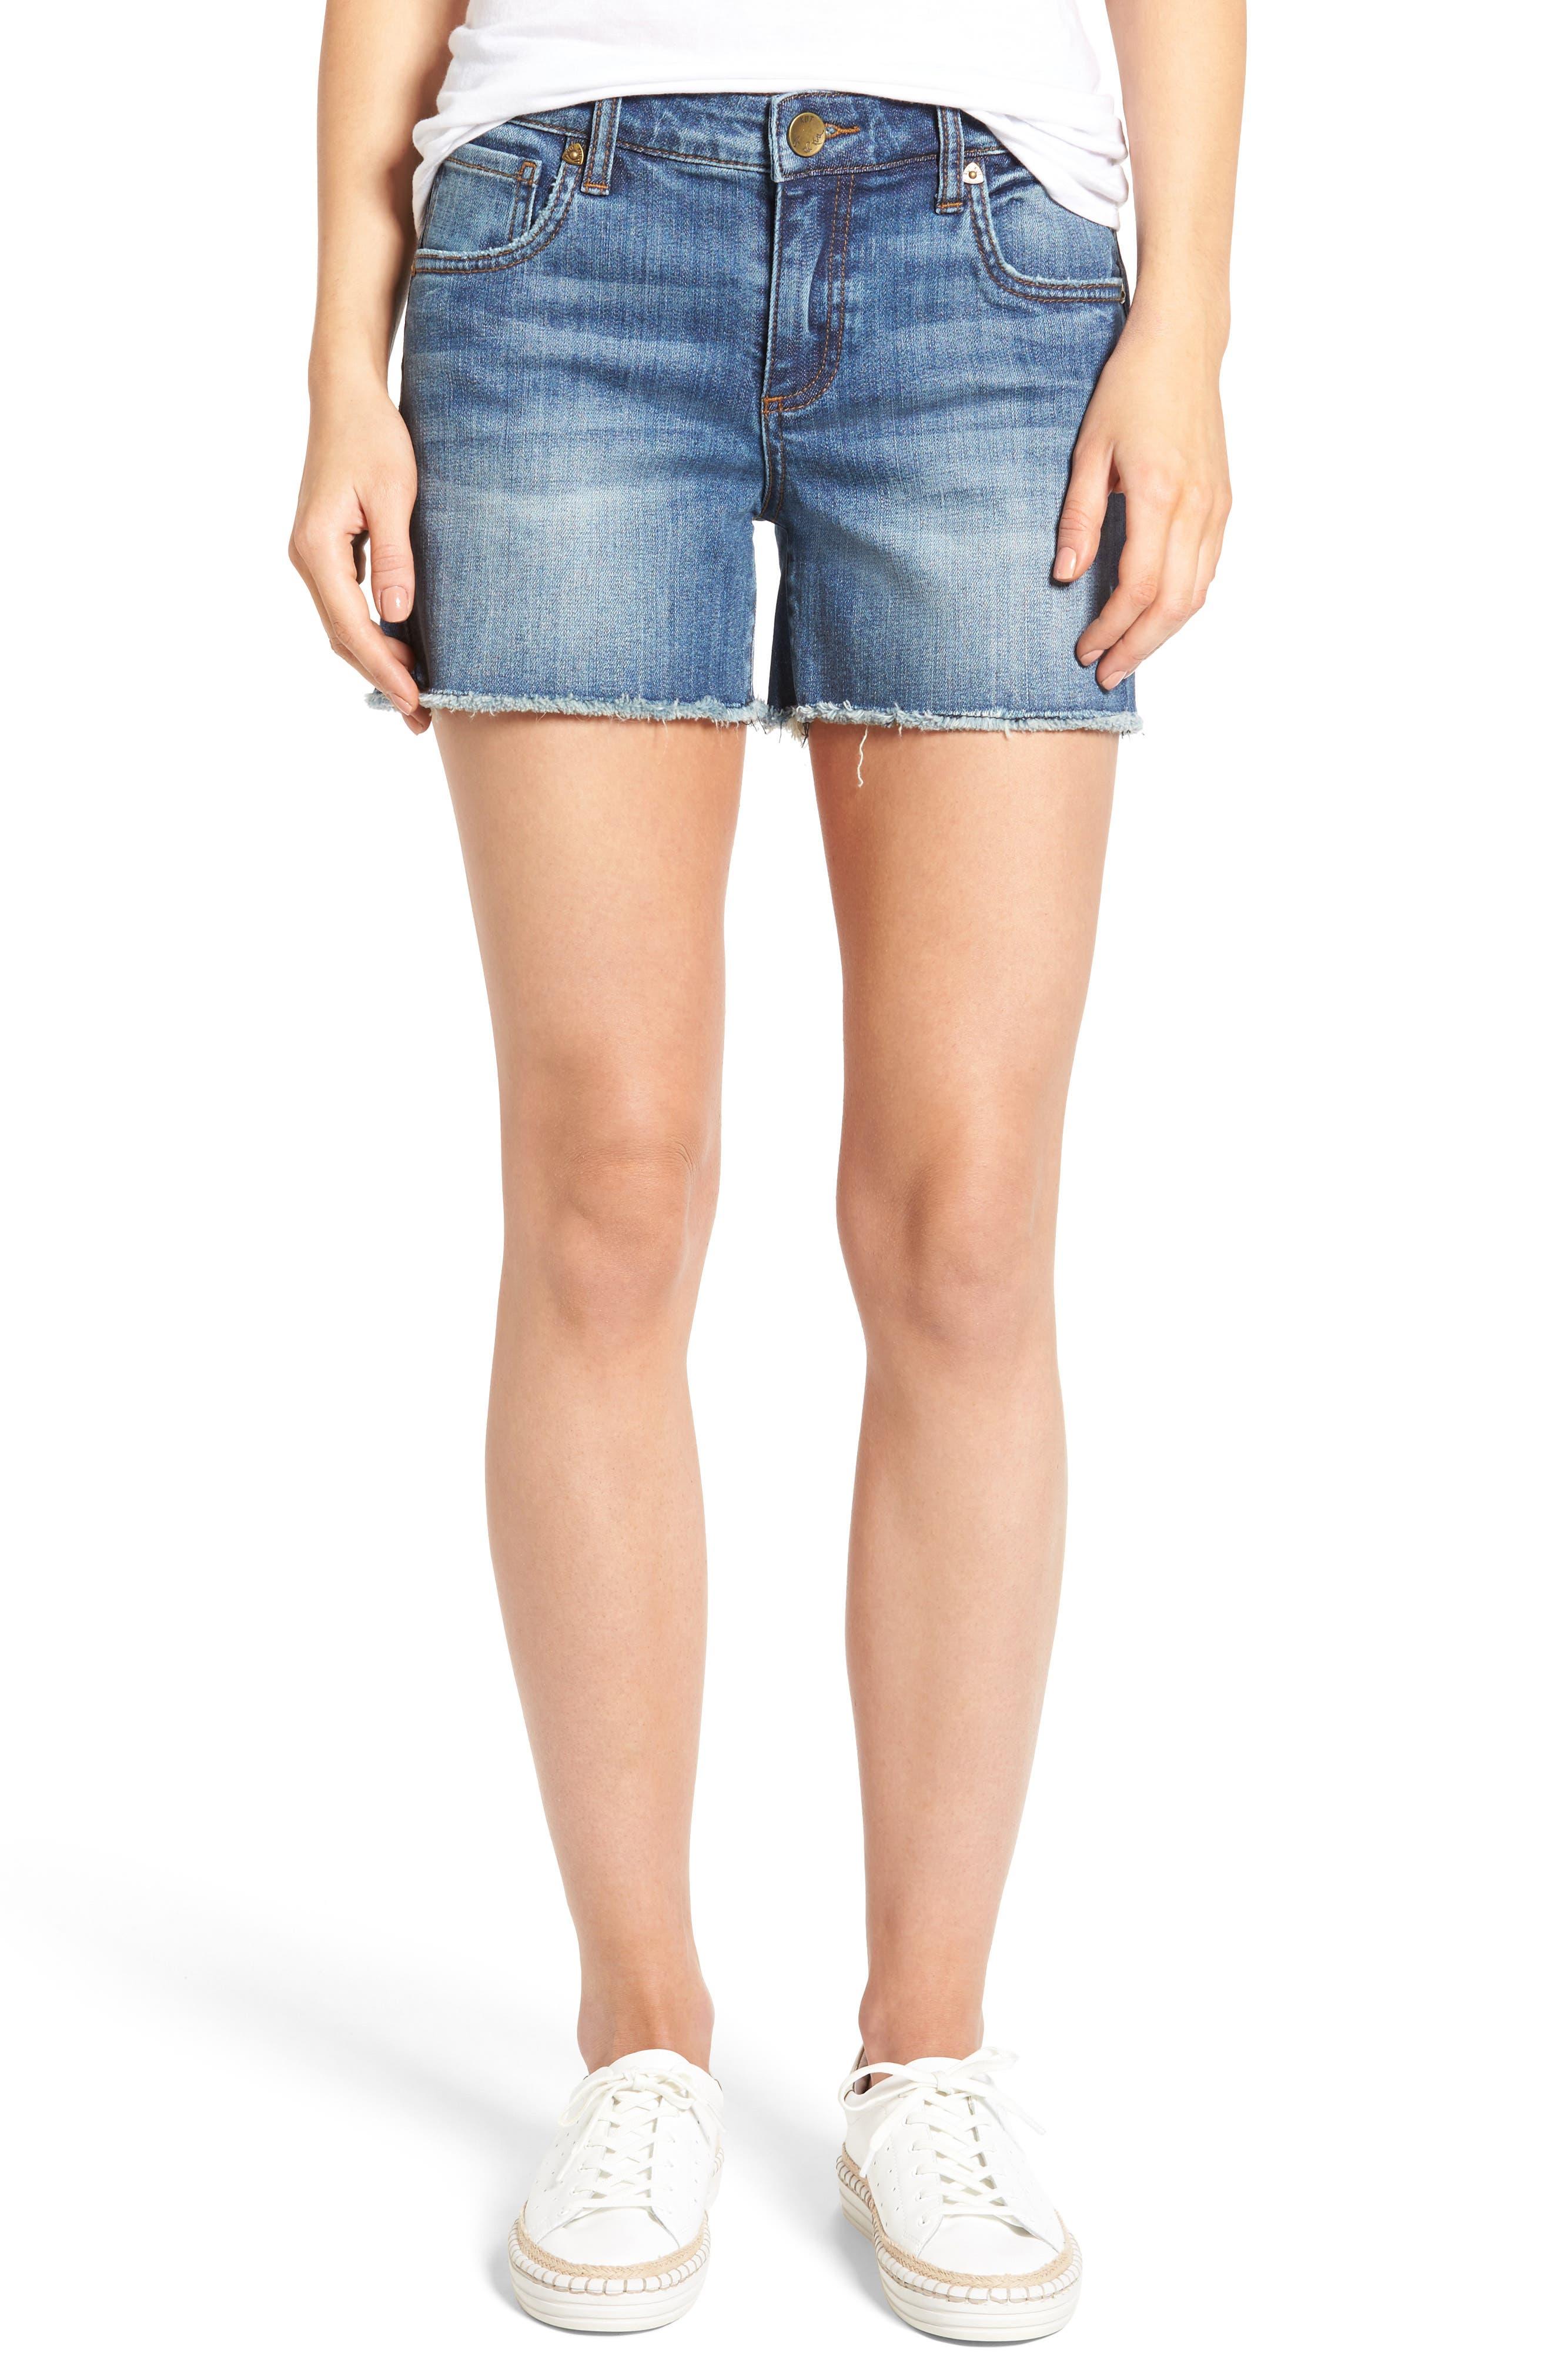 Main Image - KUT from the Kloth Gidget Denim Shorts (Consolidated) (Regular & Petite)